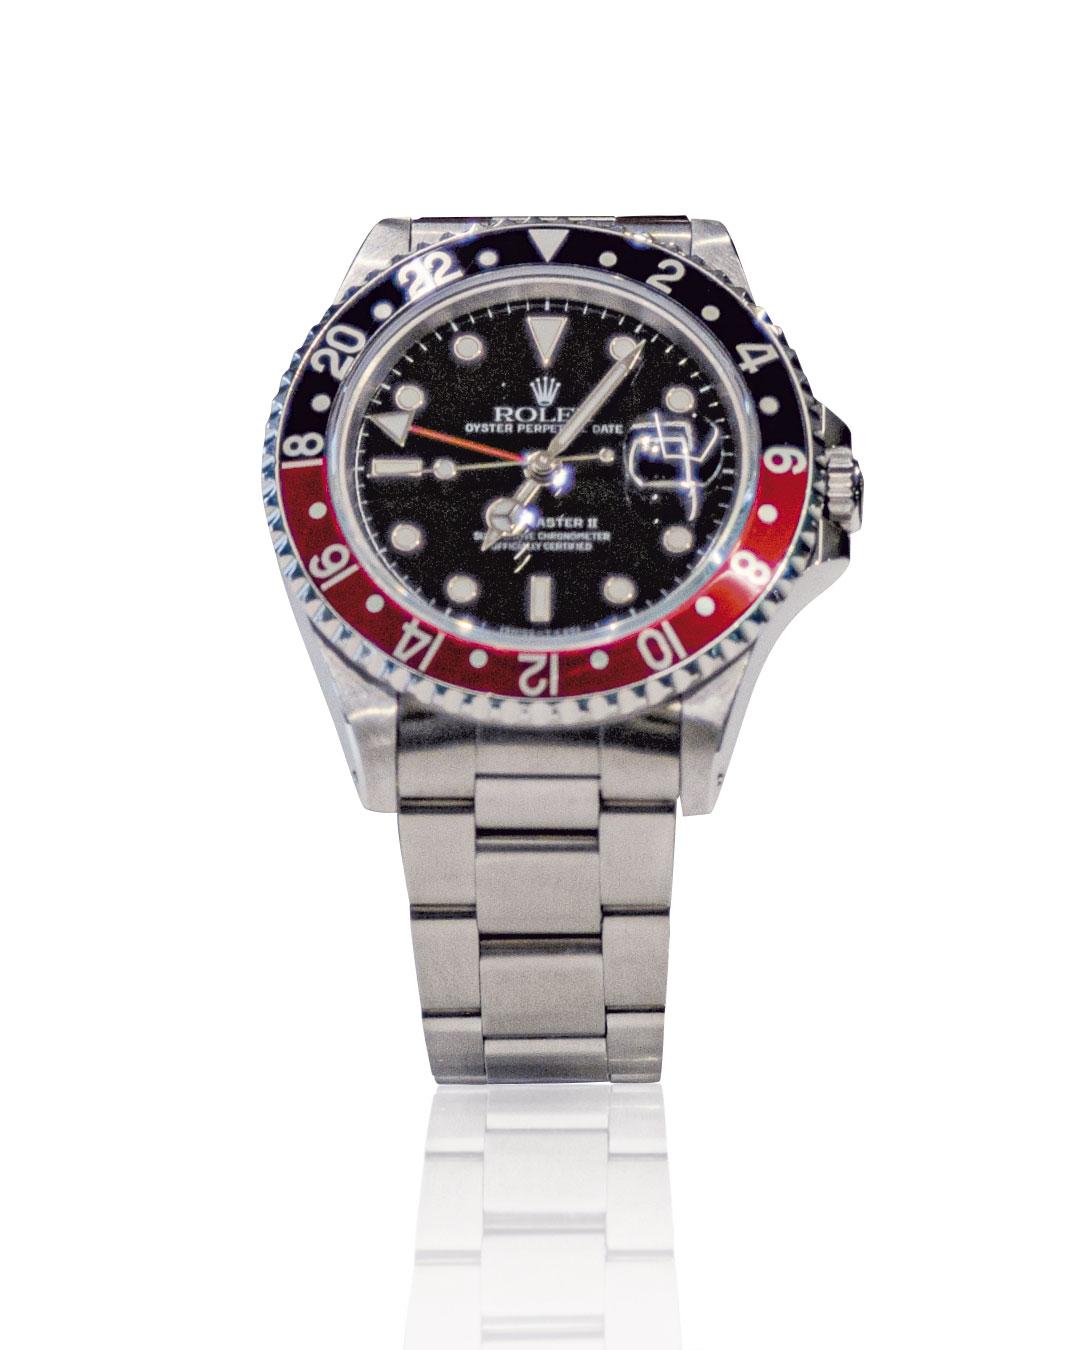 Rolex GMT-Master II (rosso e blu)